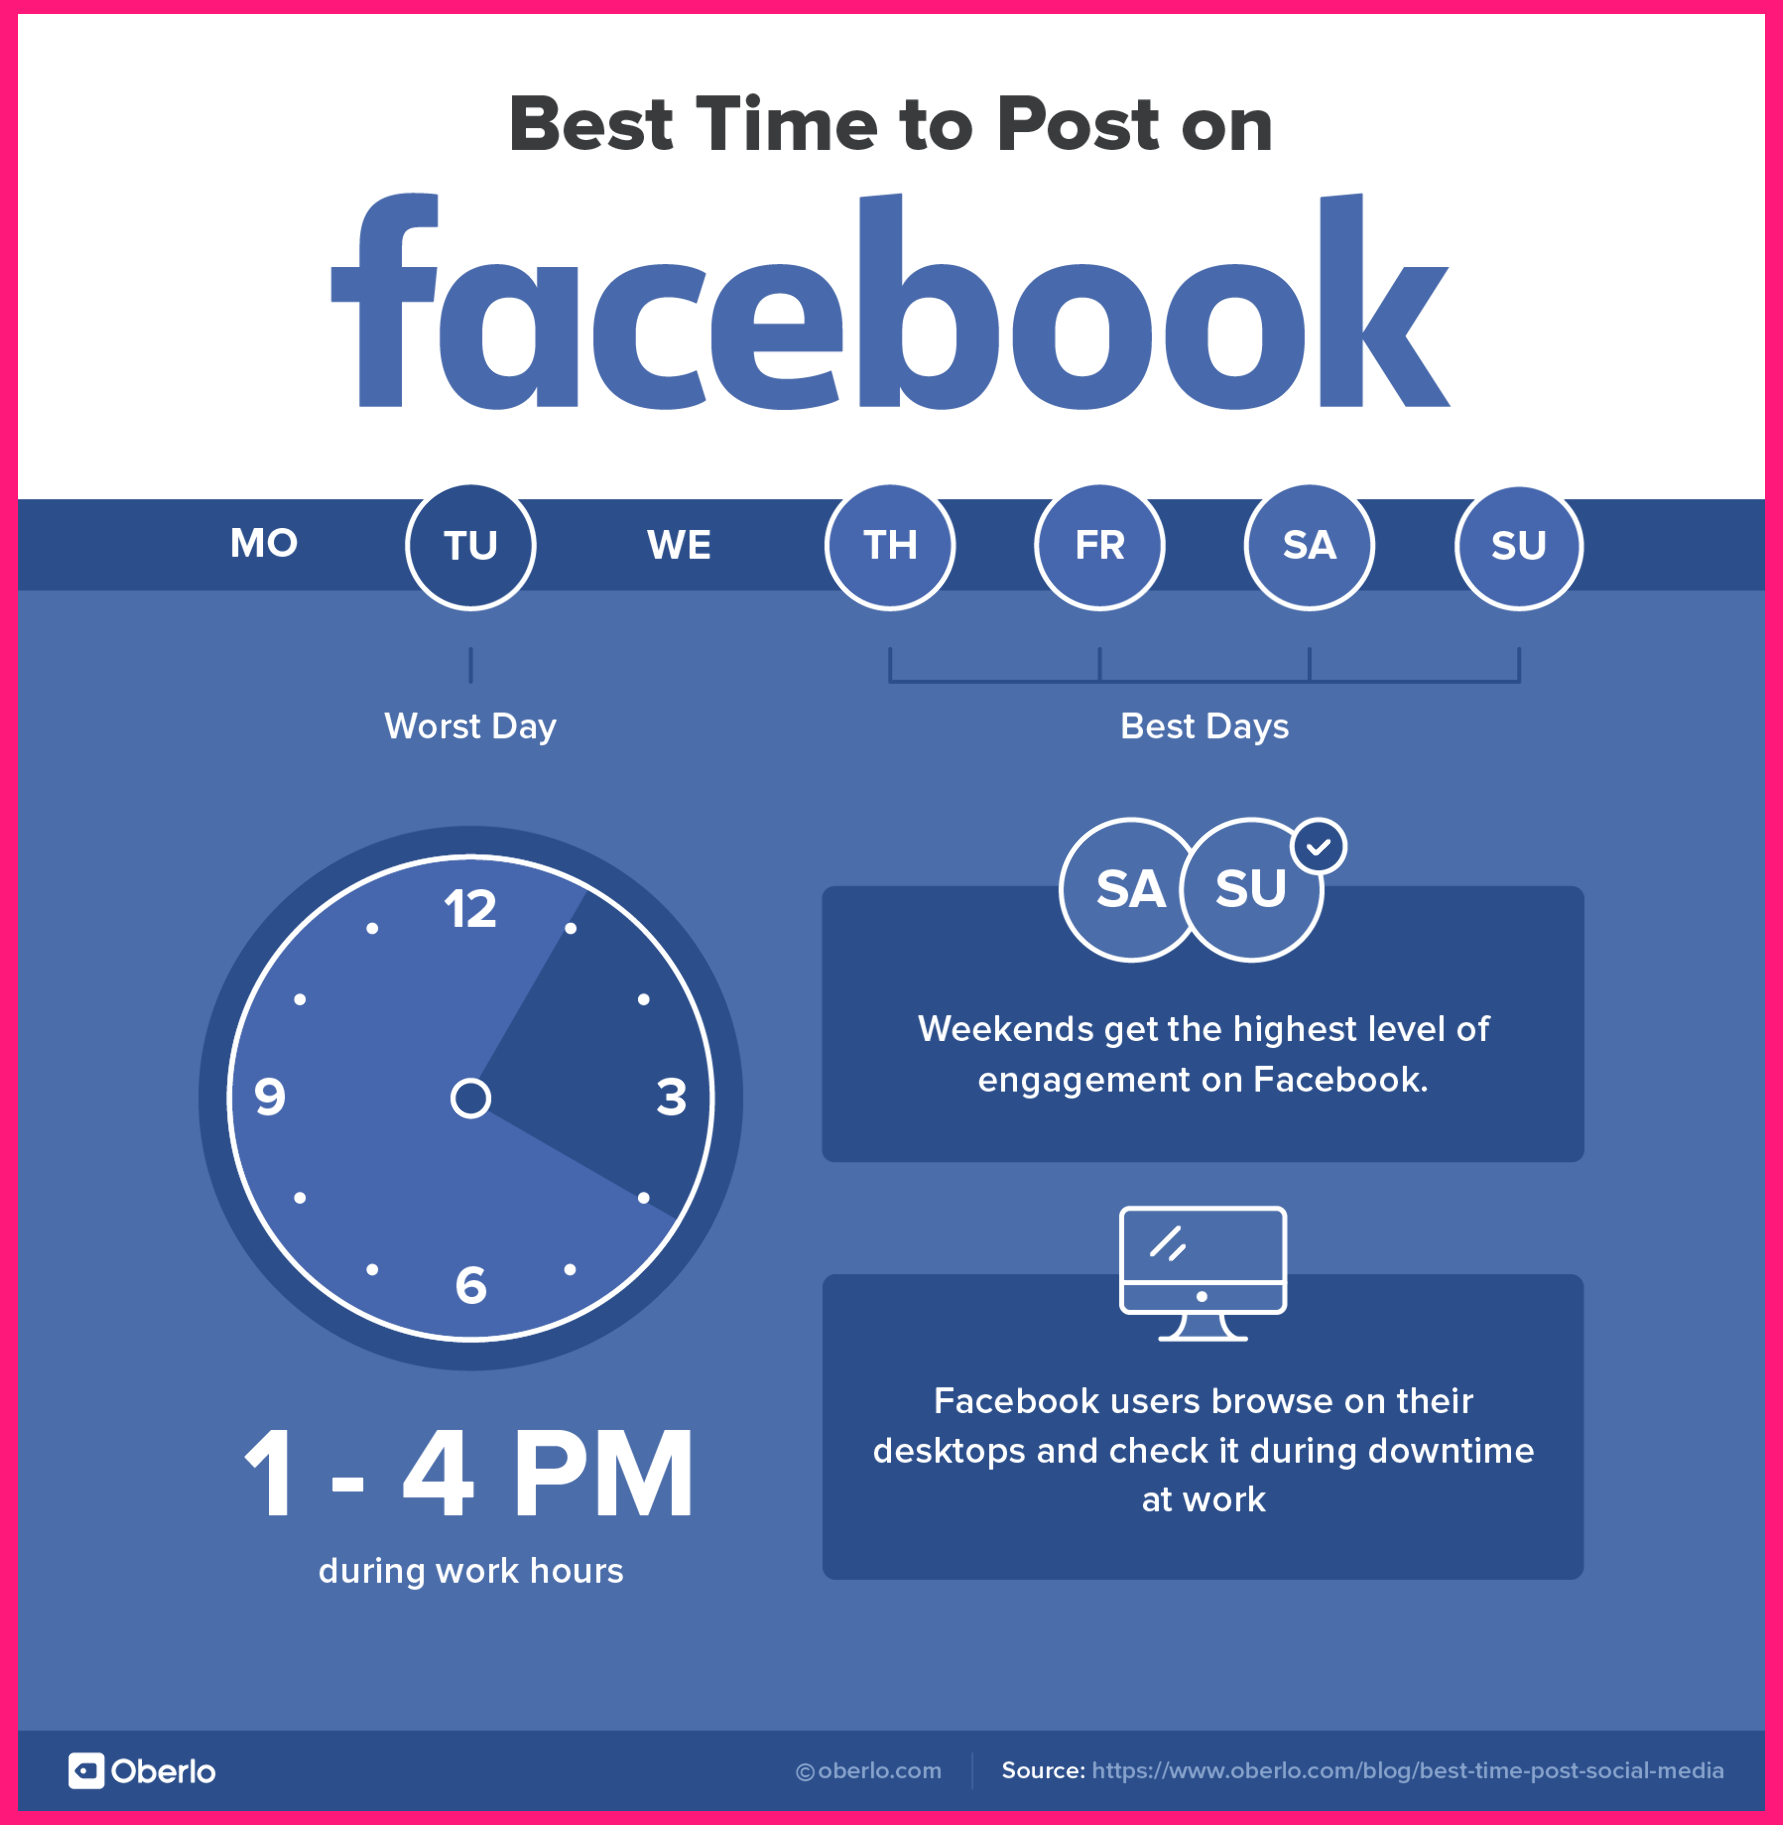 Best Time To Post On Instagram Facebook Linkedin And Twitter In 2020 Social Media Brandi In 2020 Facebook Marketing Best Time To Post How To Use Facebook